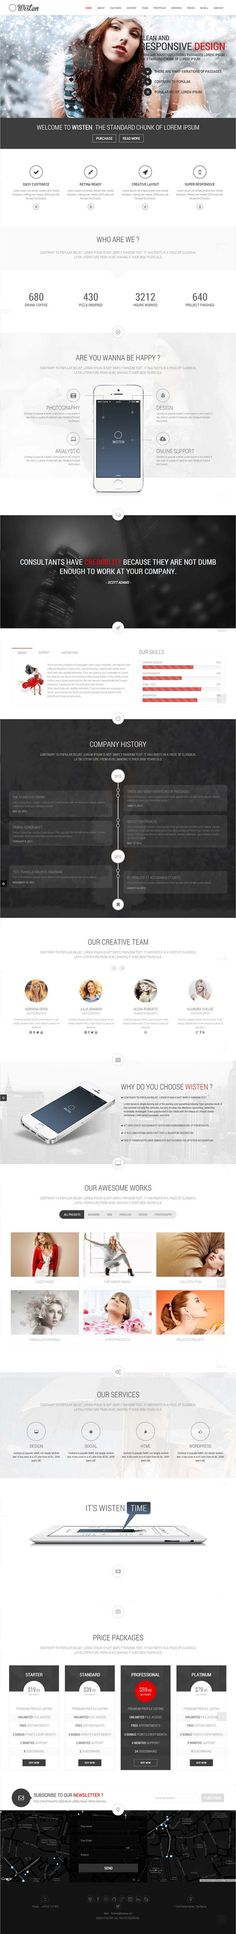 Wisten – WordPress One Page Parallax Theme #html5themes #wordpressthemes #responsivedesign #responsivewordpressthemes